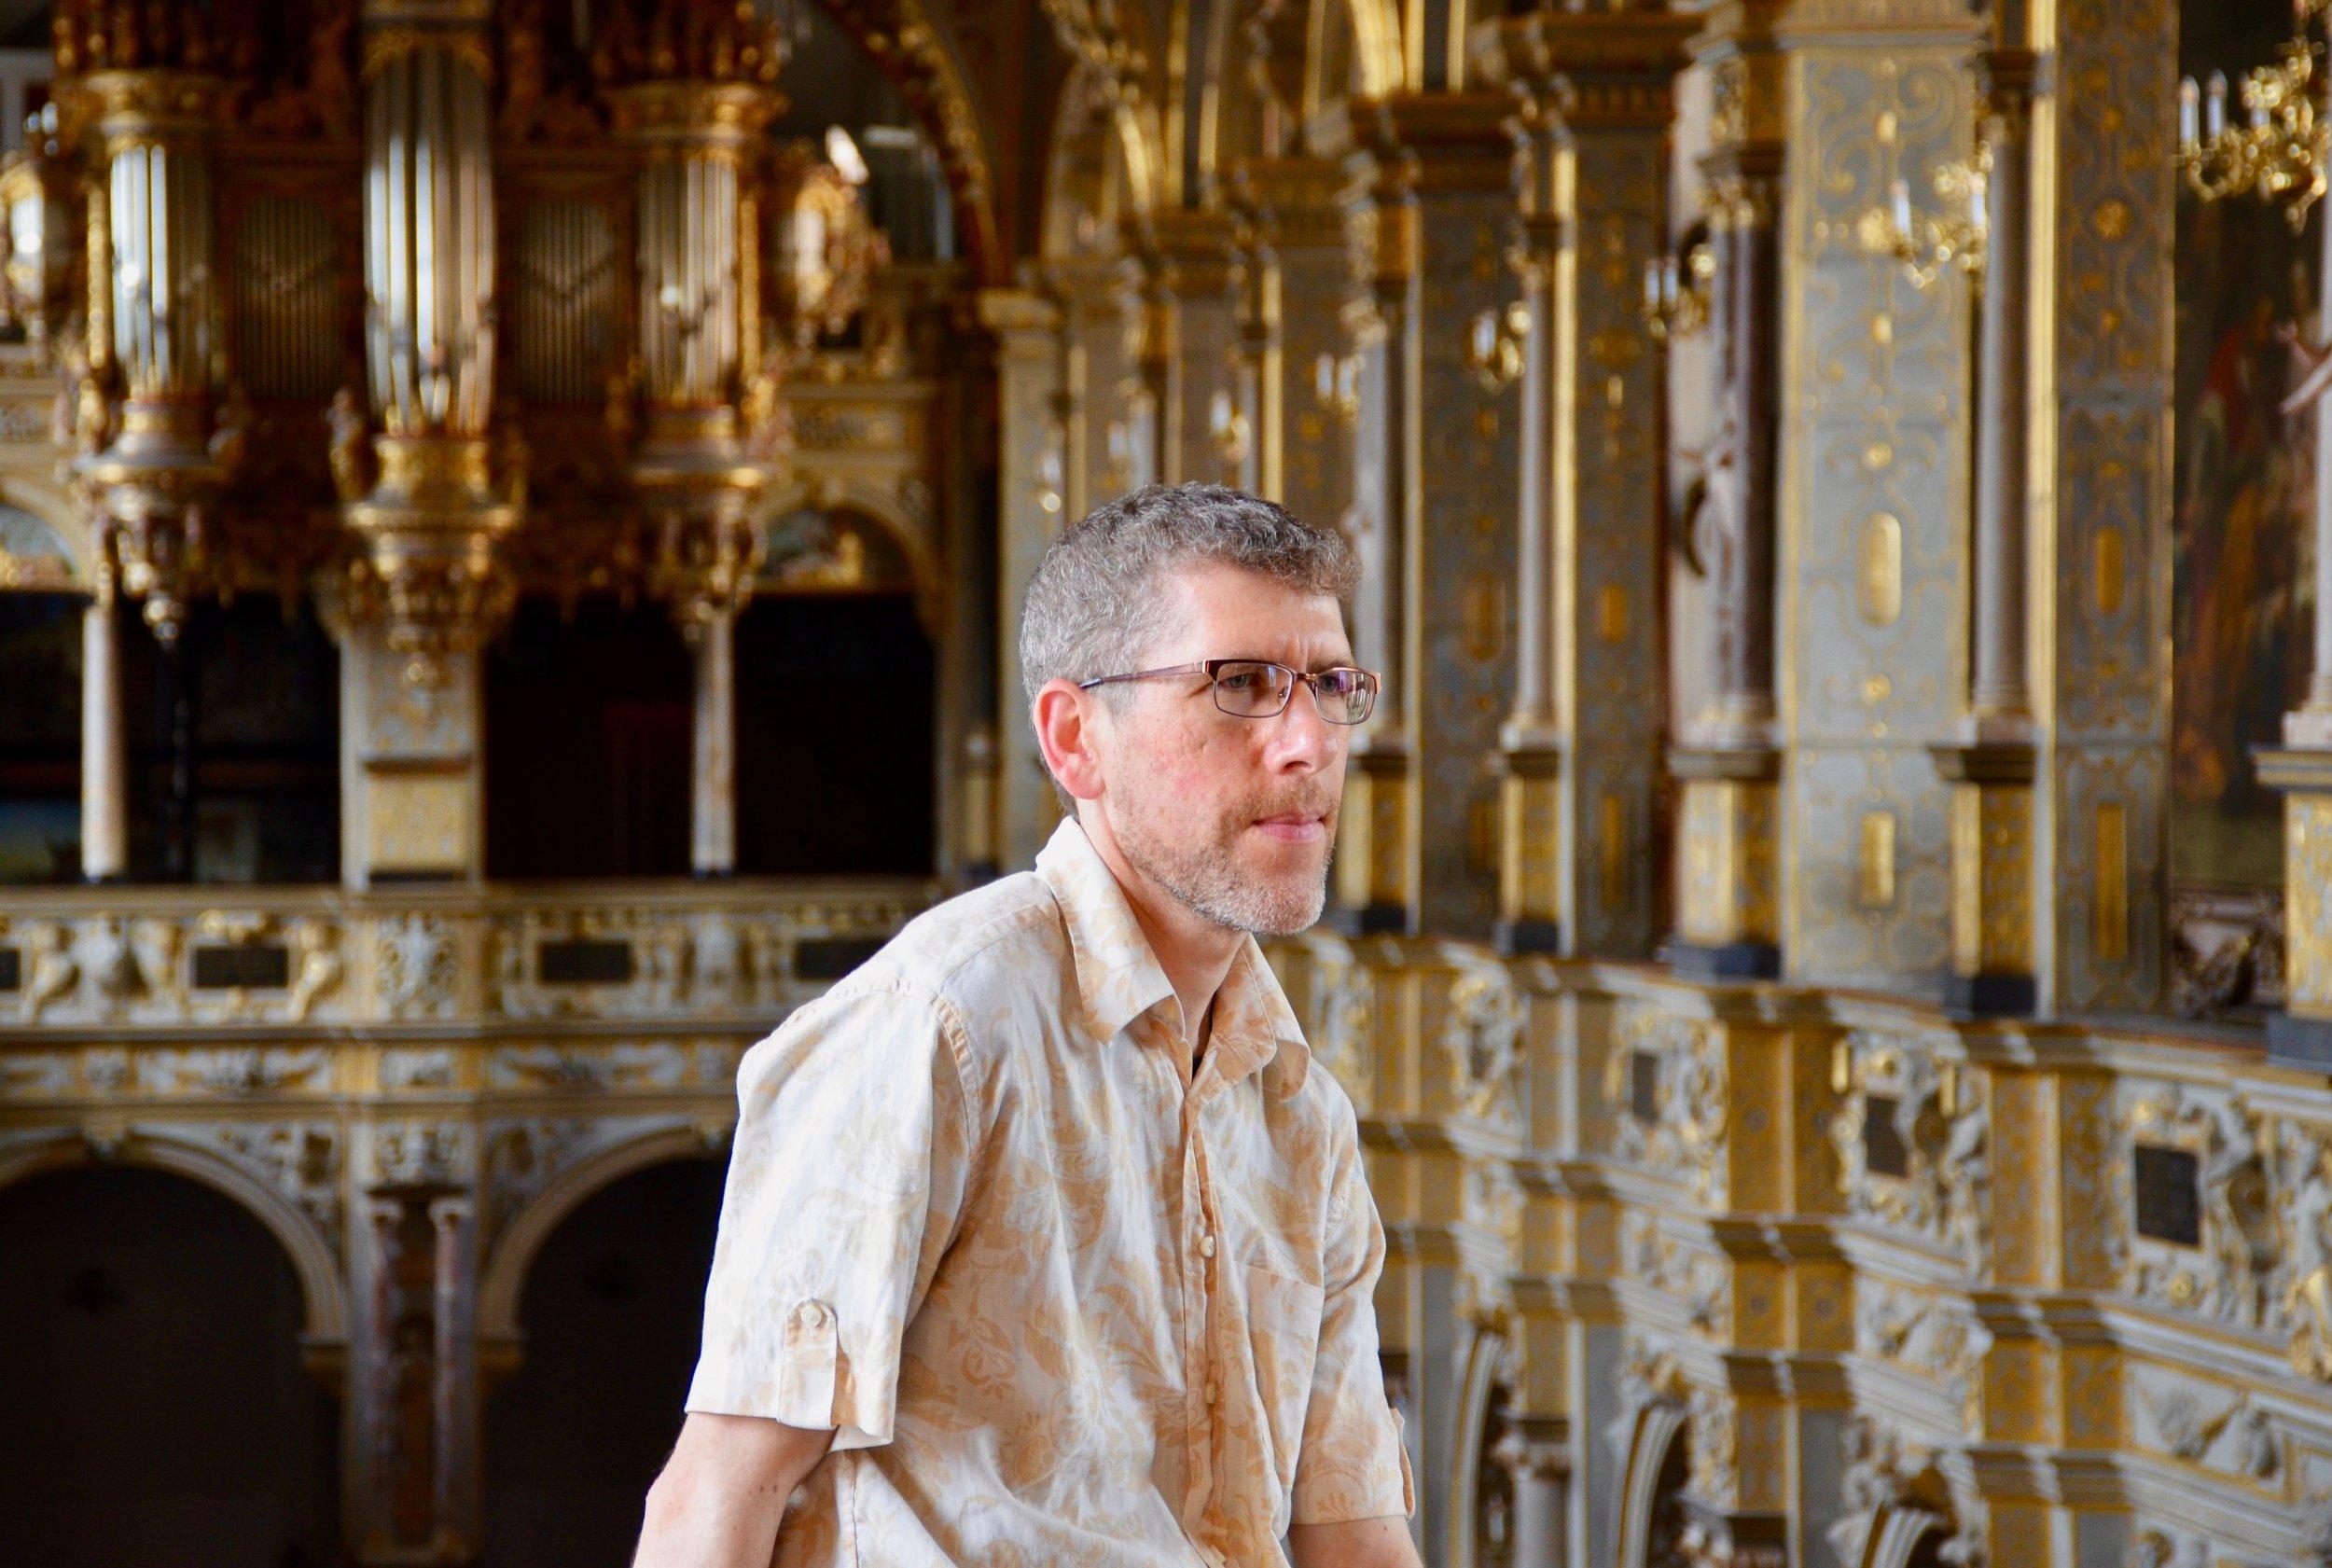 Chris Porter listens to the 1610 Compenius organ, Frederiksborg Castle, Hillerød, Denmark.